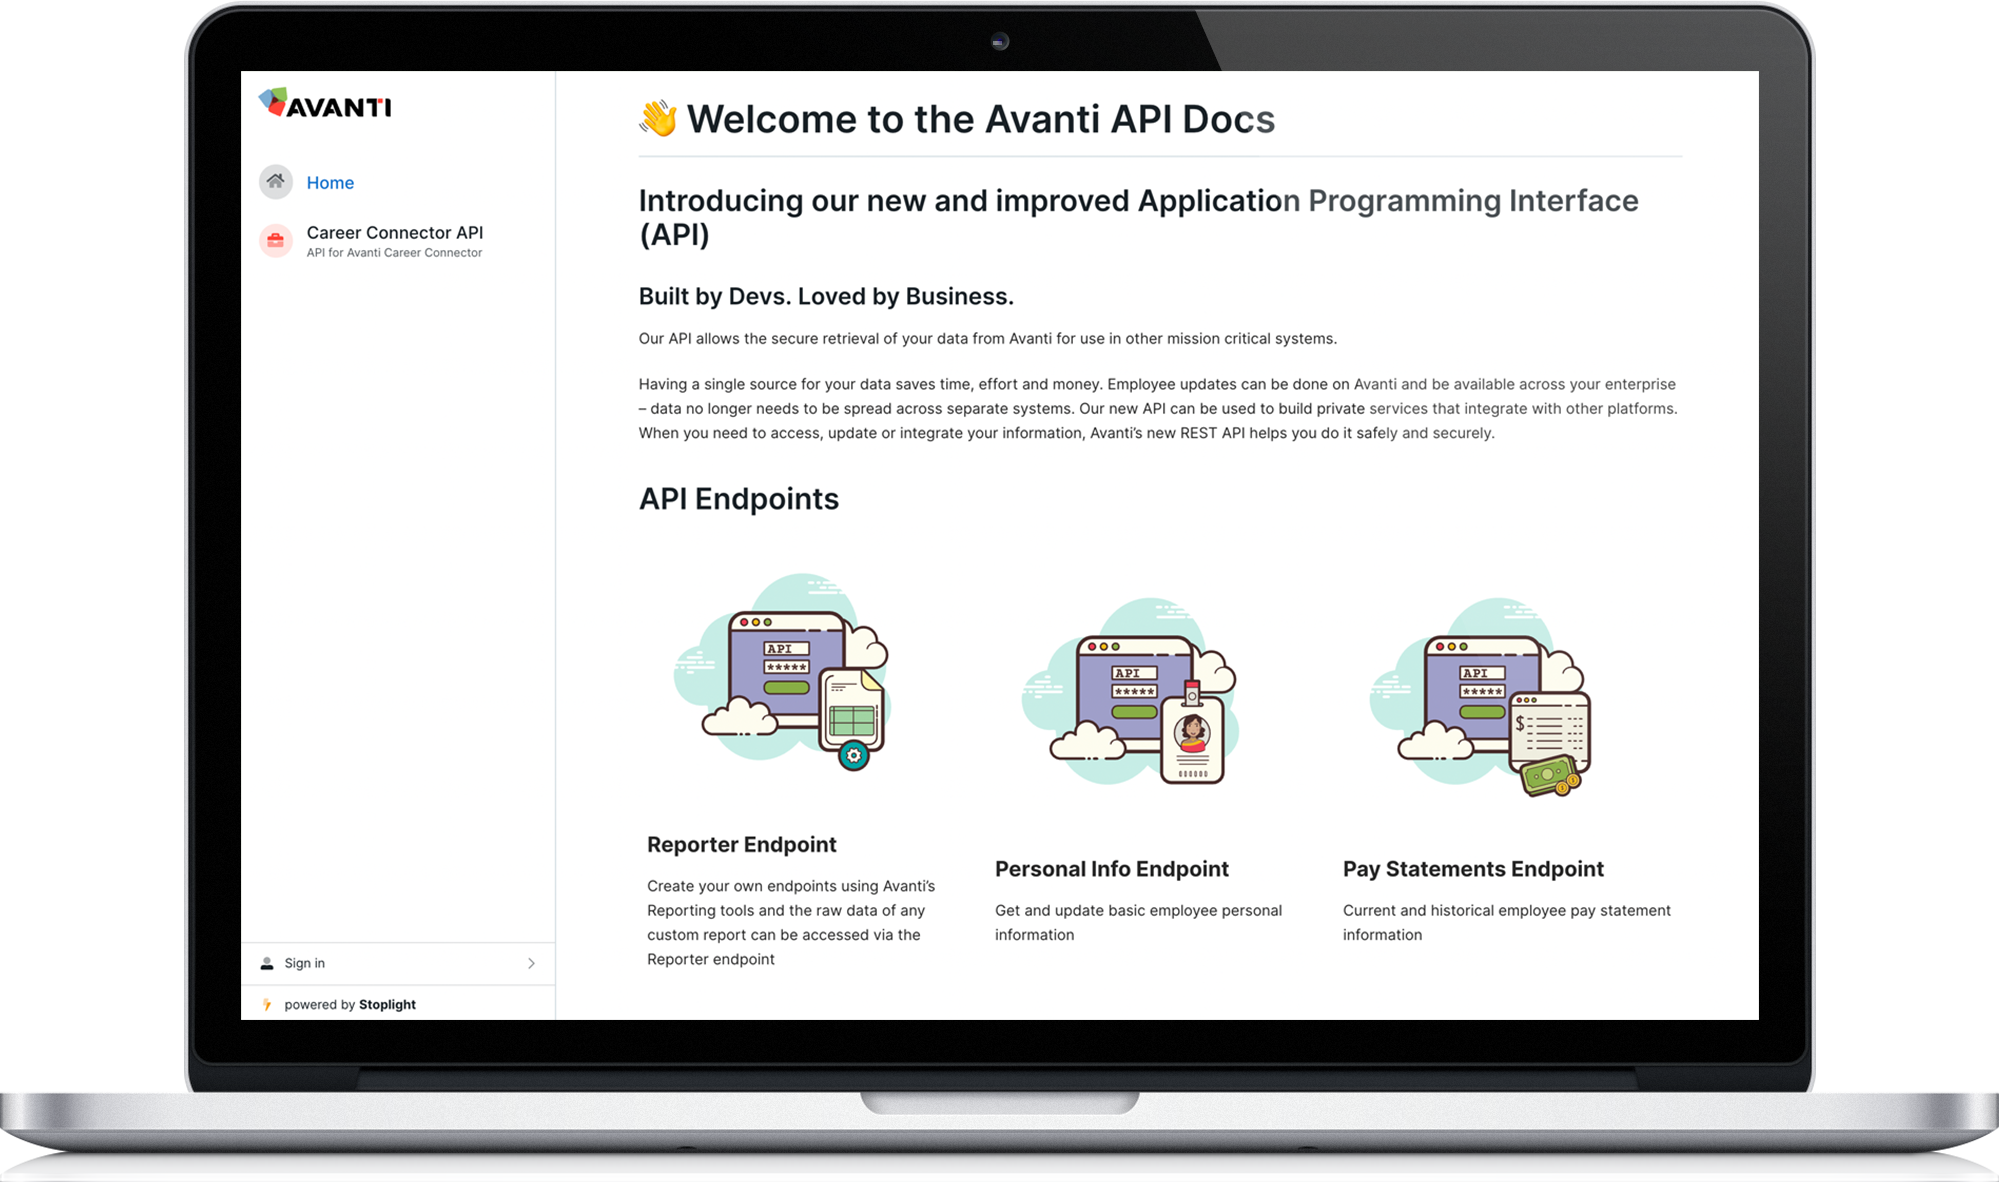 Avanti API Docs page screenshot